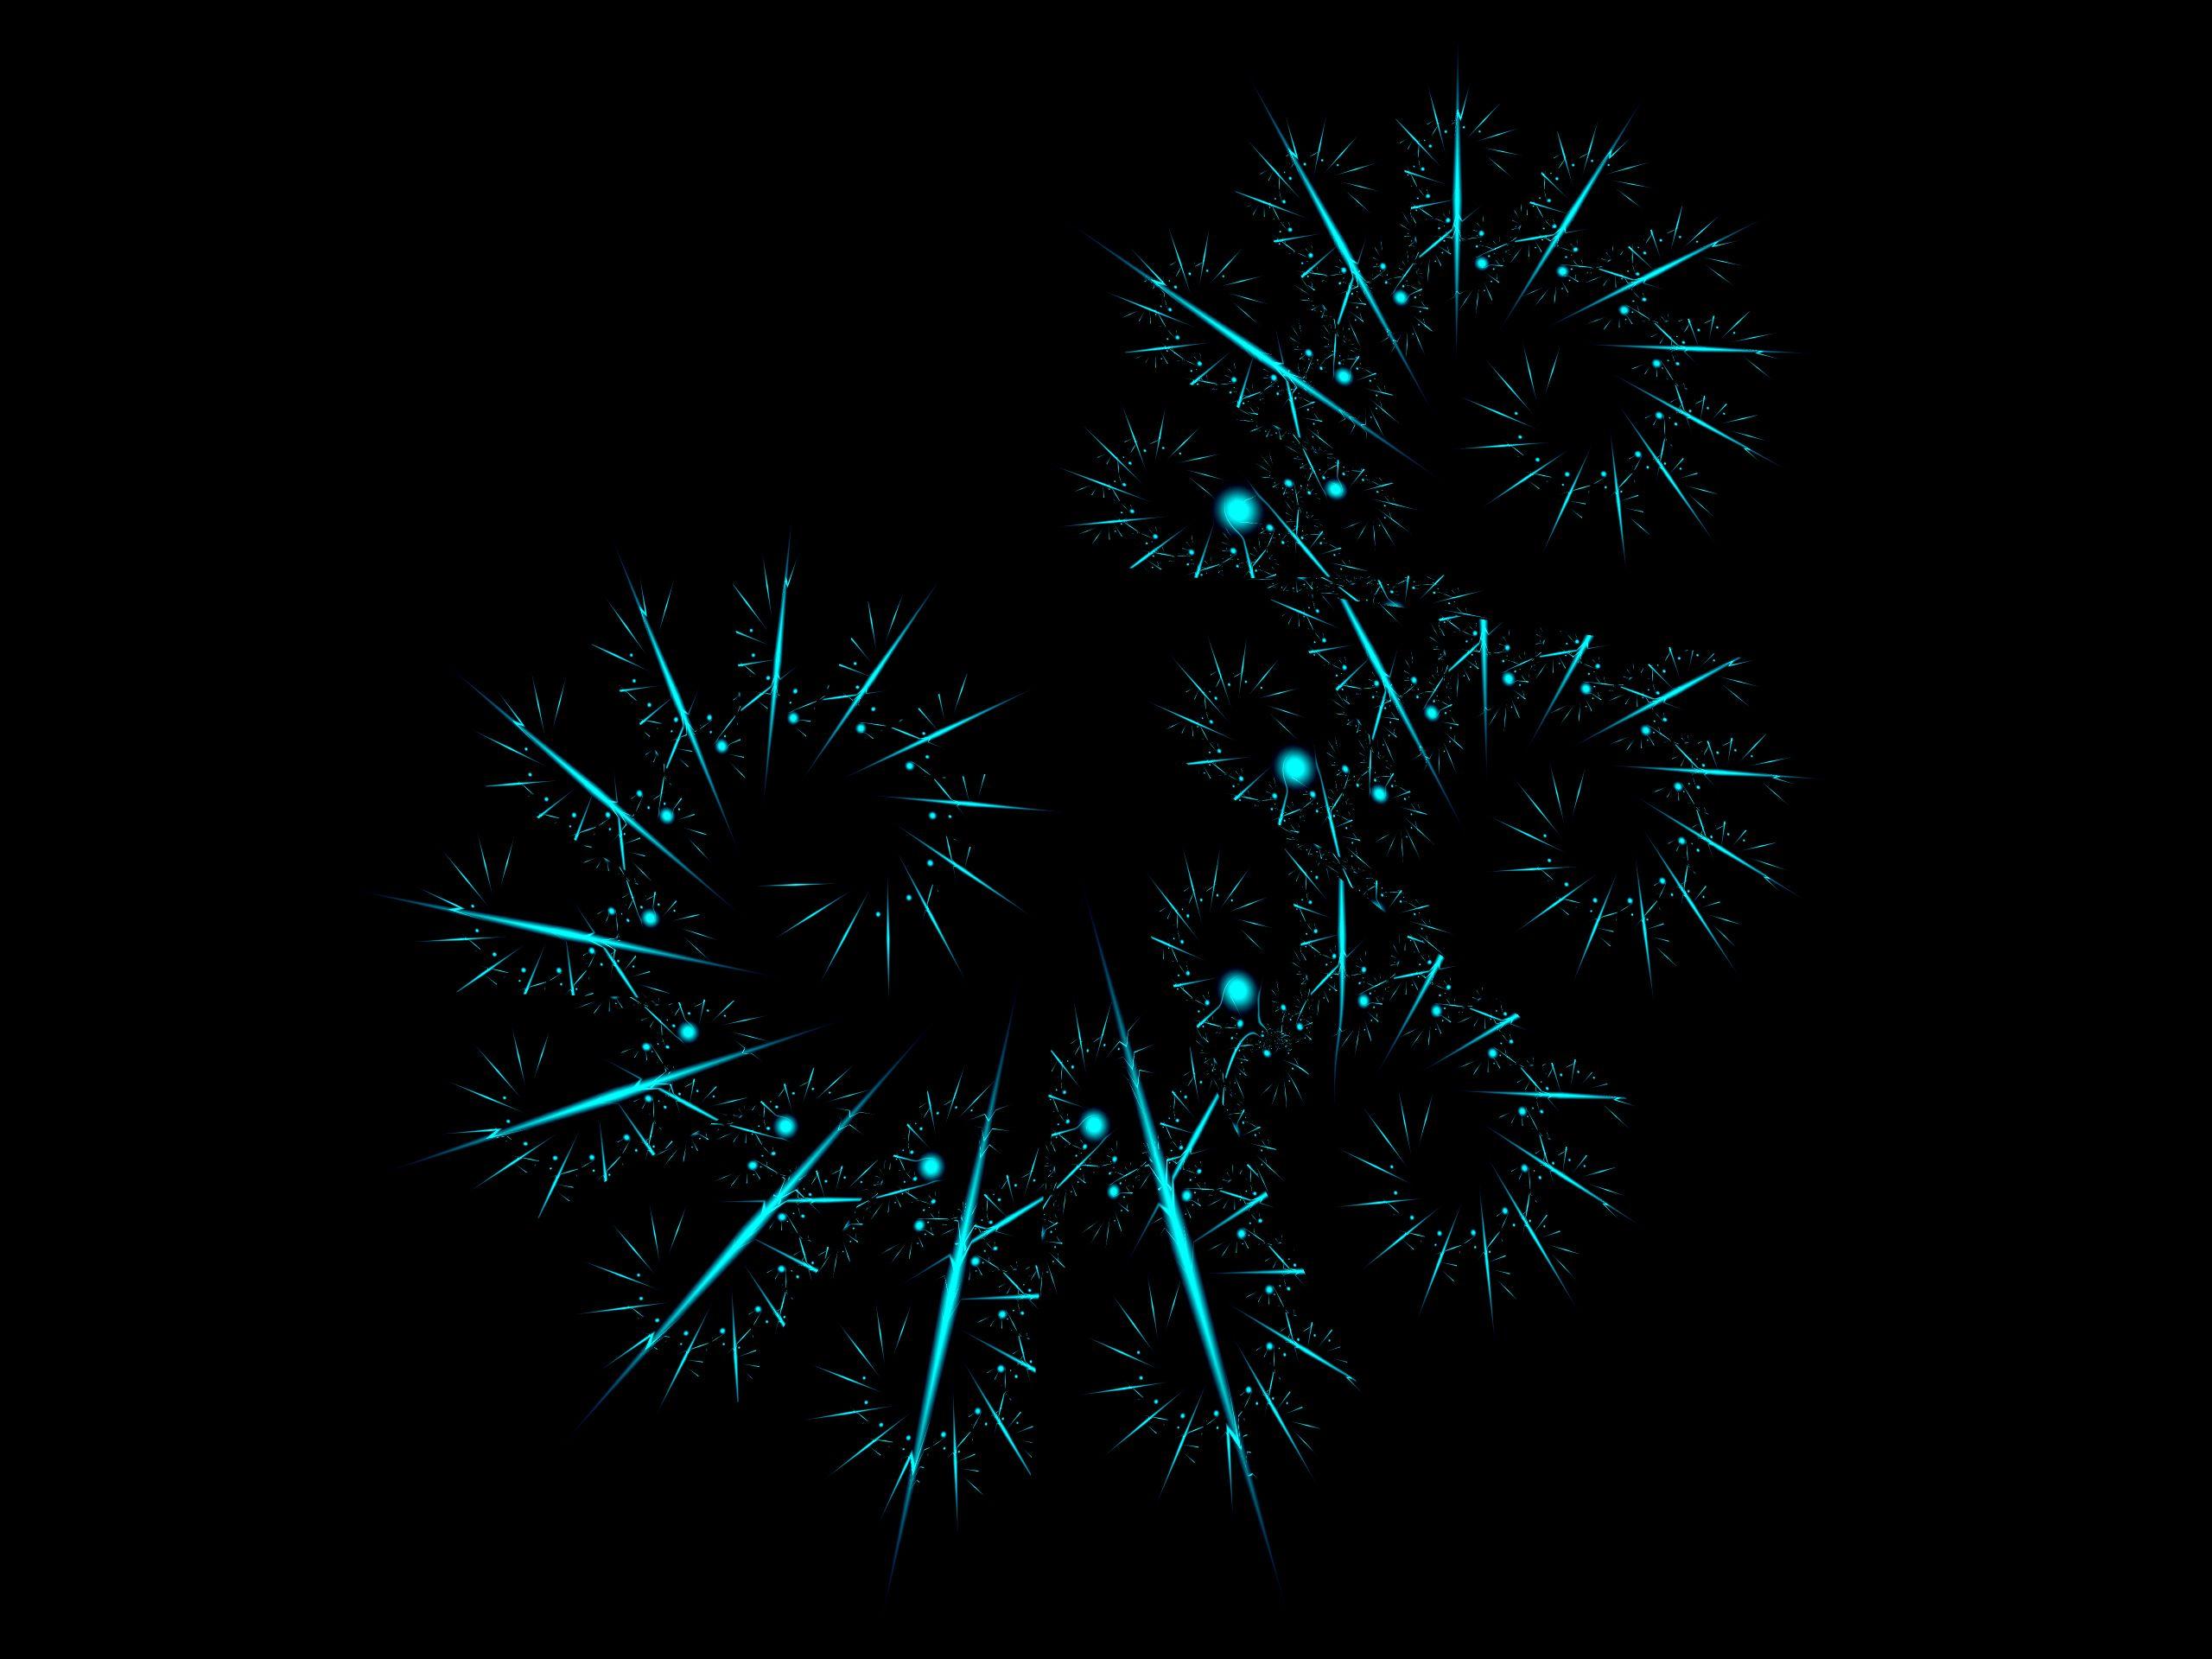 ubik.spine-2 by mauxuam.deviantart.com#abstract #fractal #fractals #trippy #psychedelic